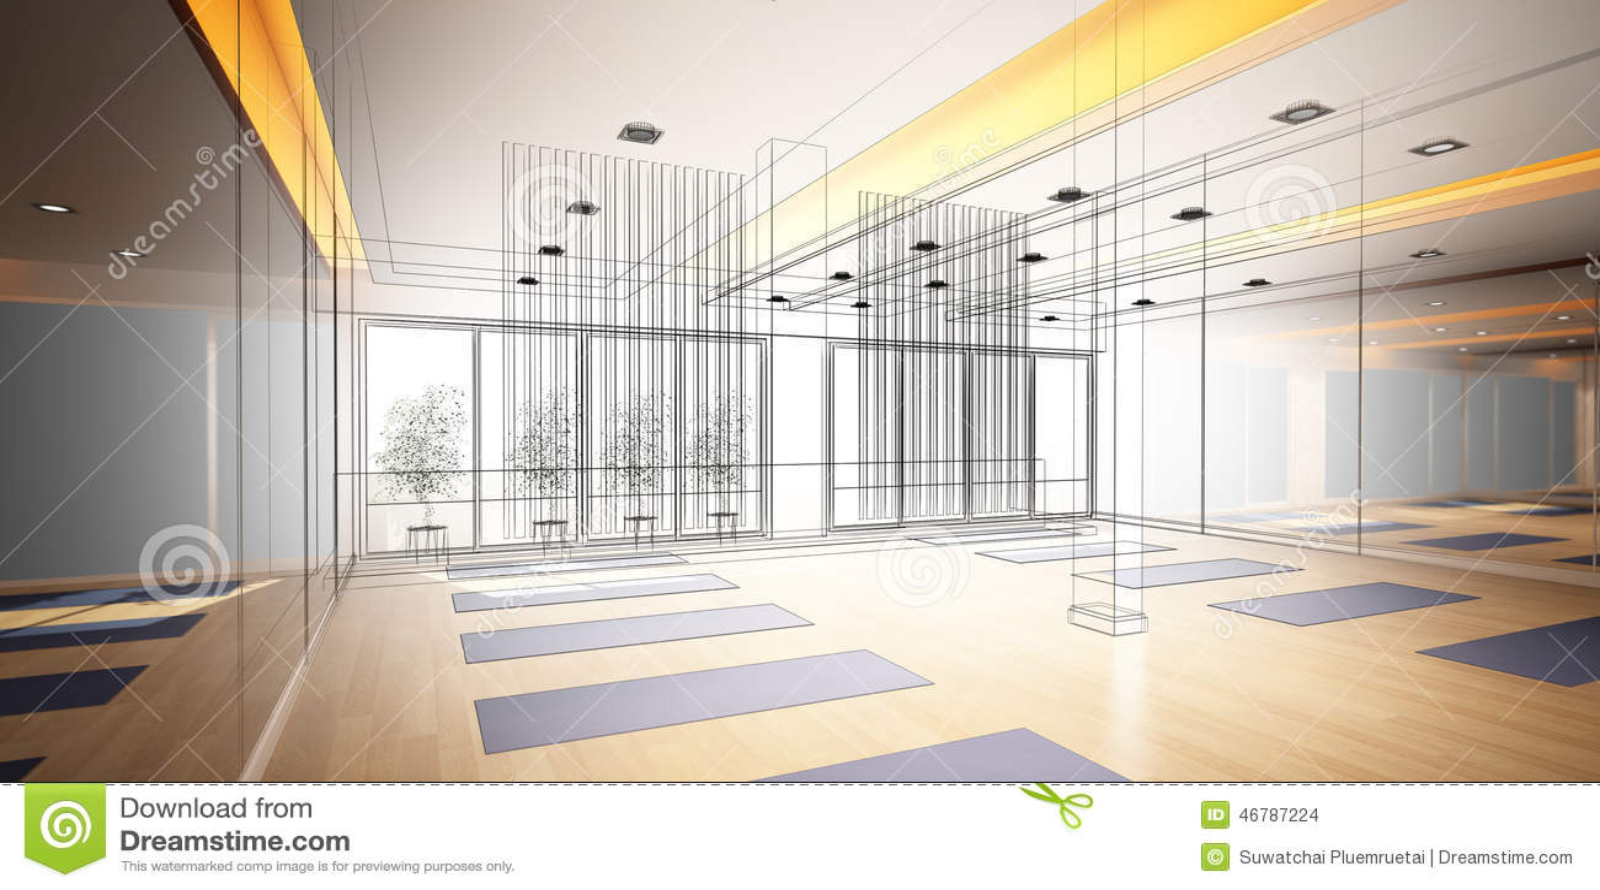 Yoga Pose Light For Room